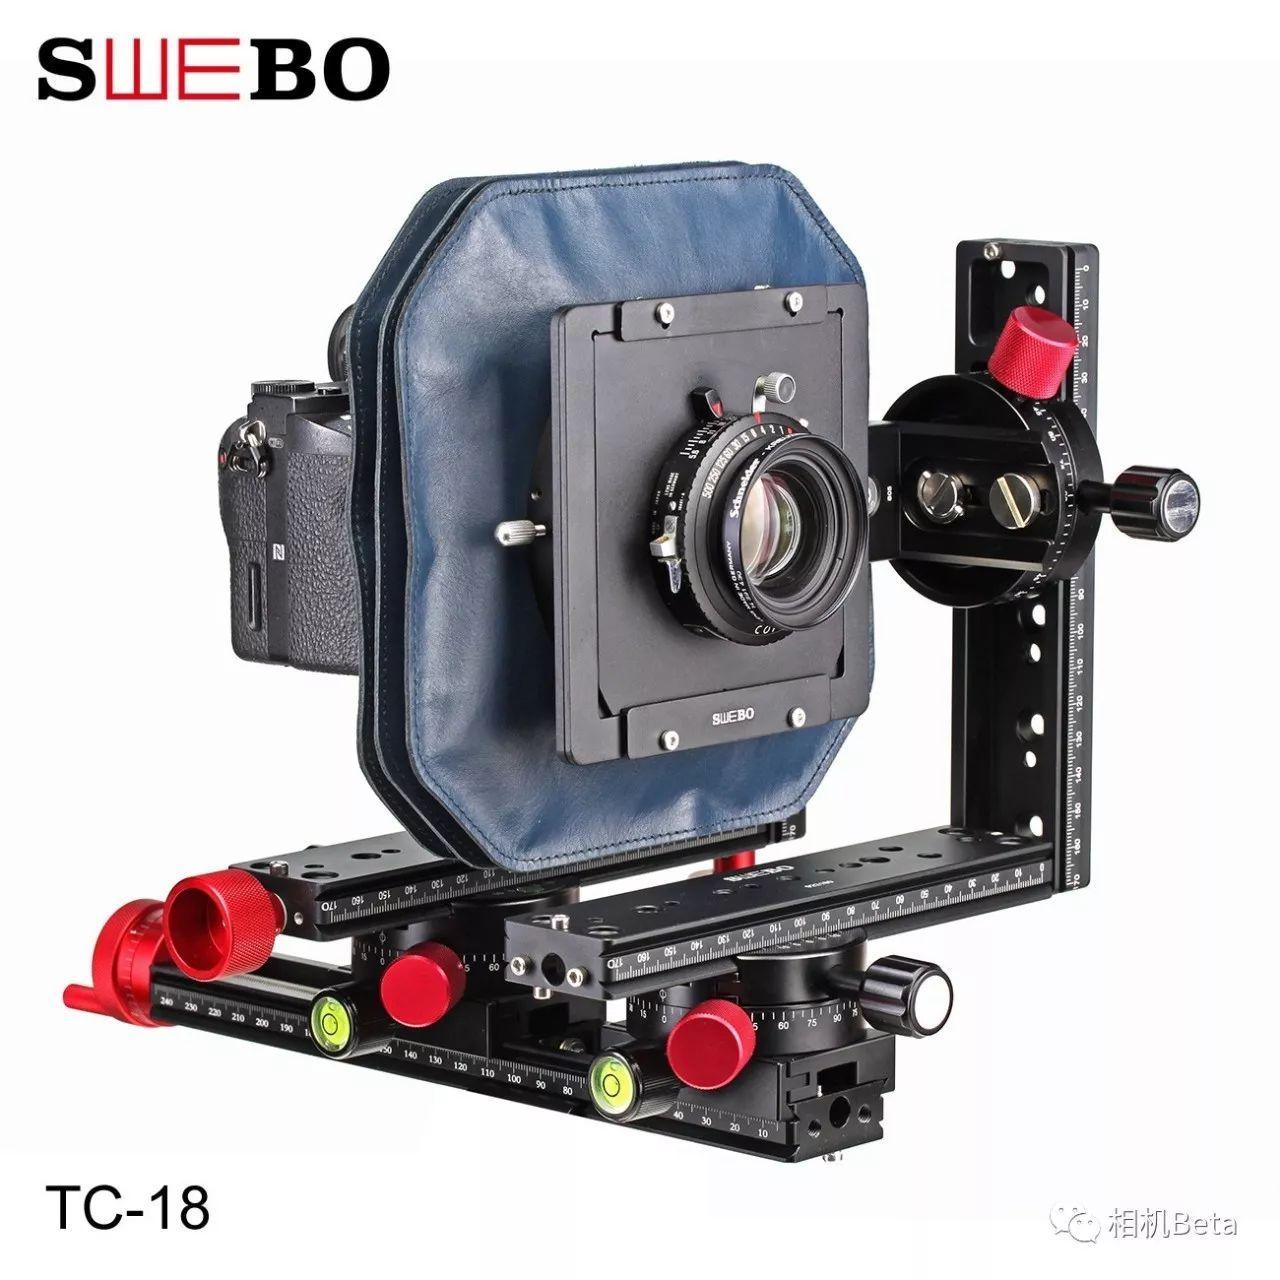 SWEBO积木化微单轨技术相机系统升级